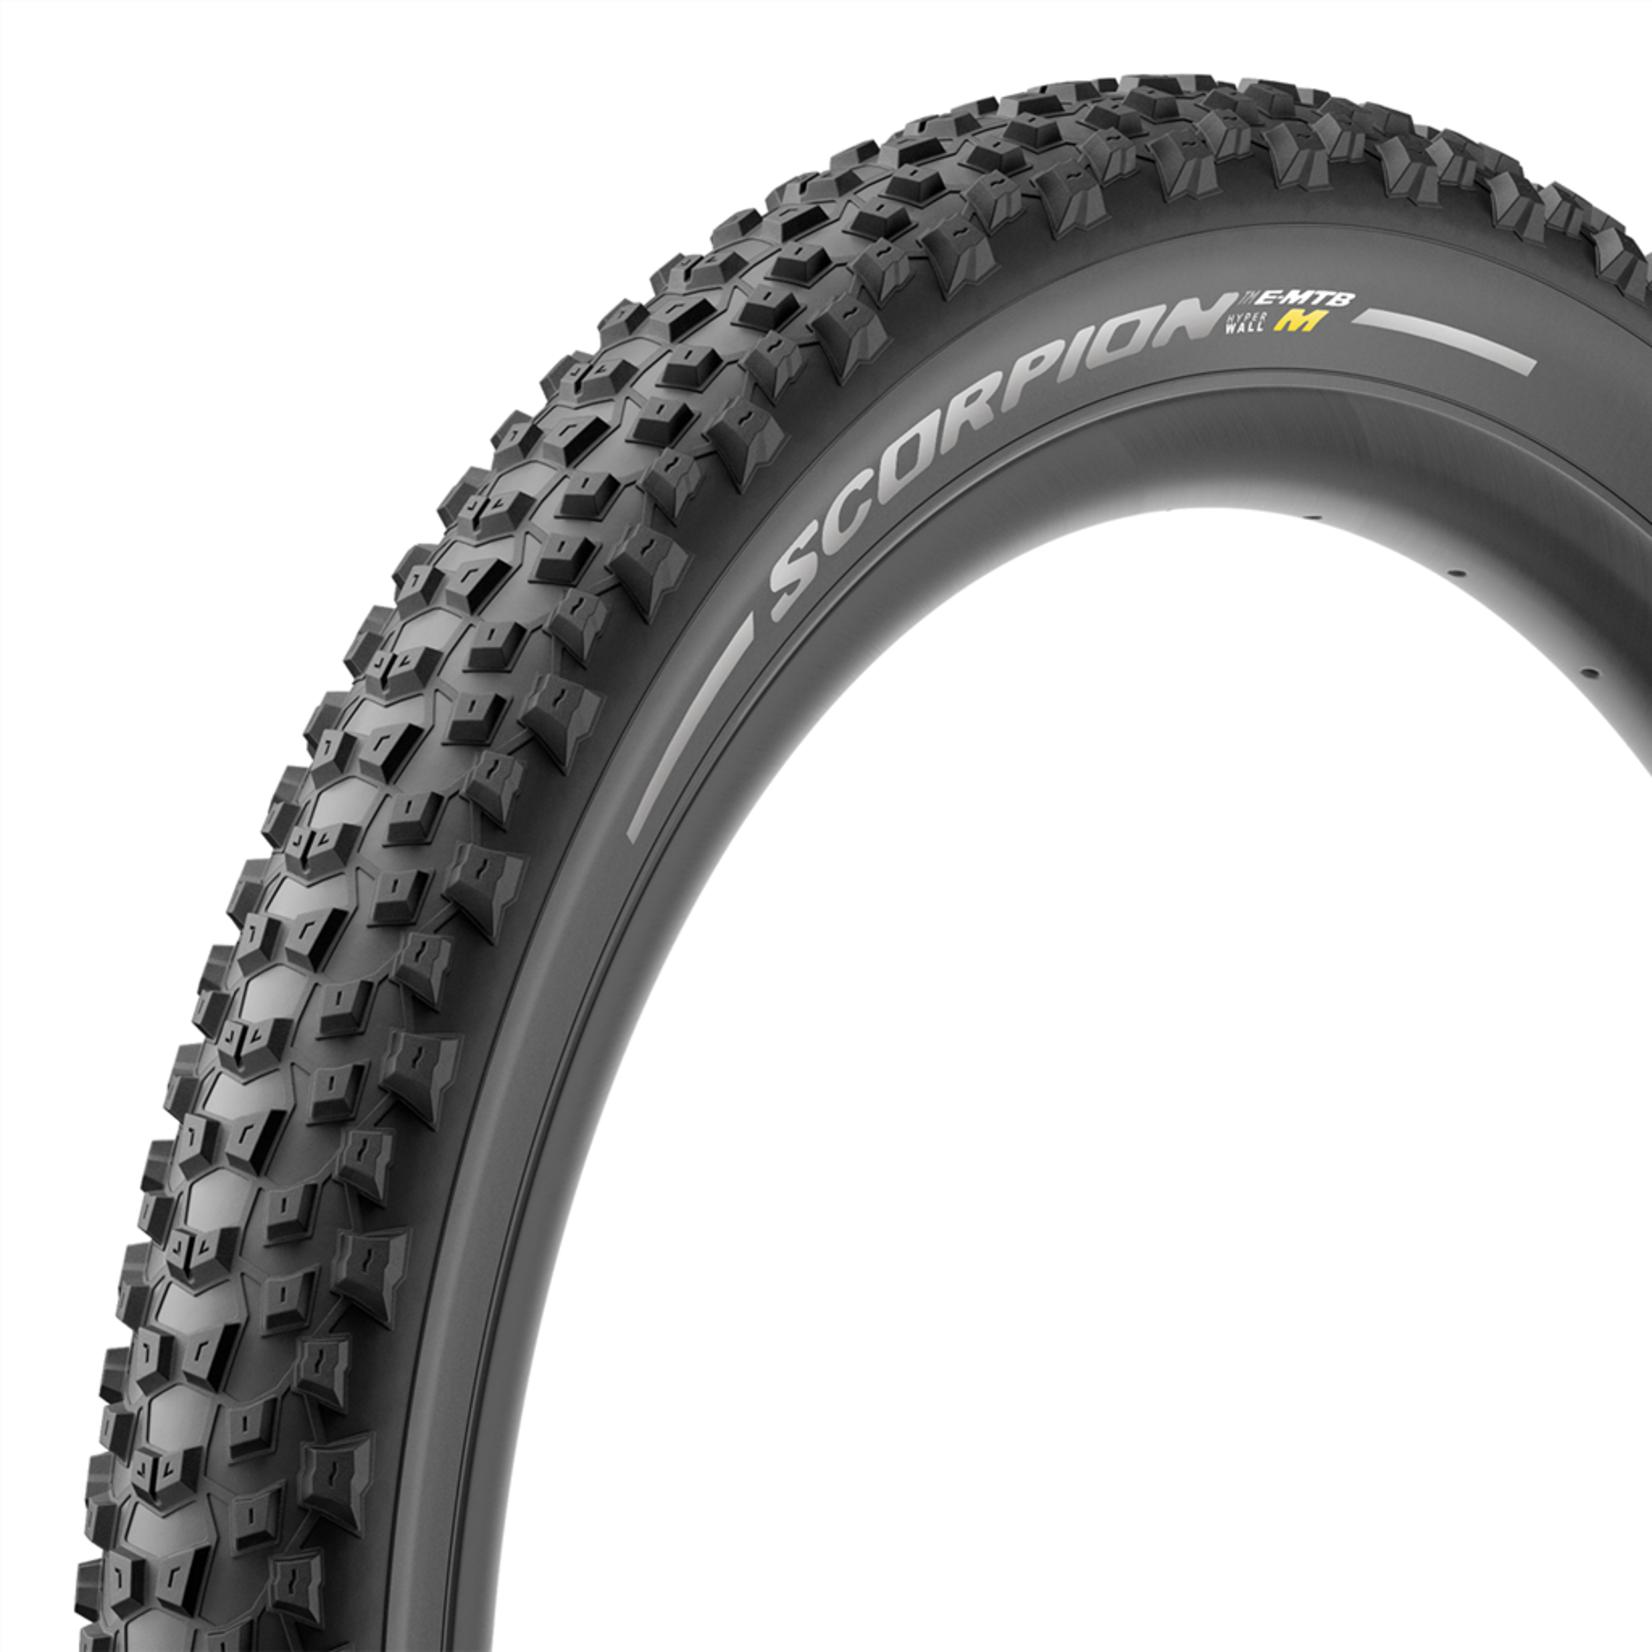 Pirelli Pirelli - Scorpion E-MTB M 27.5x2.60 Hyperwall